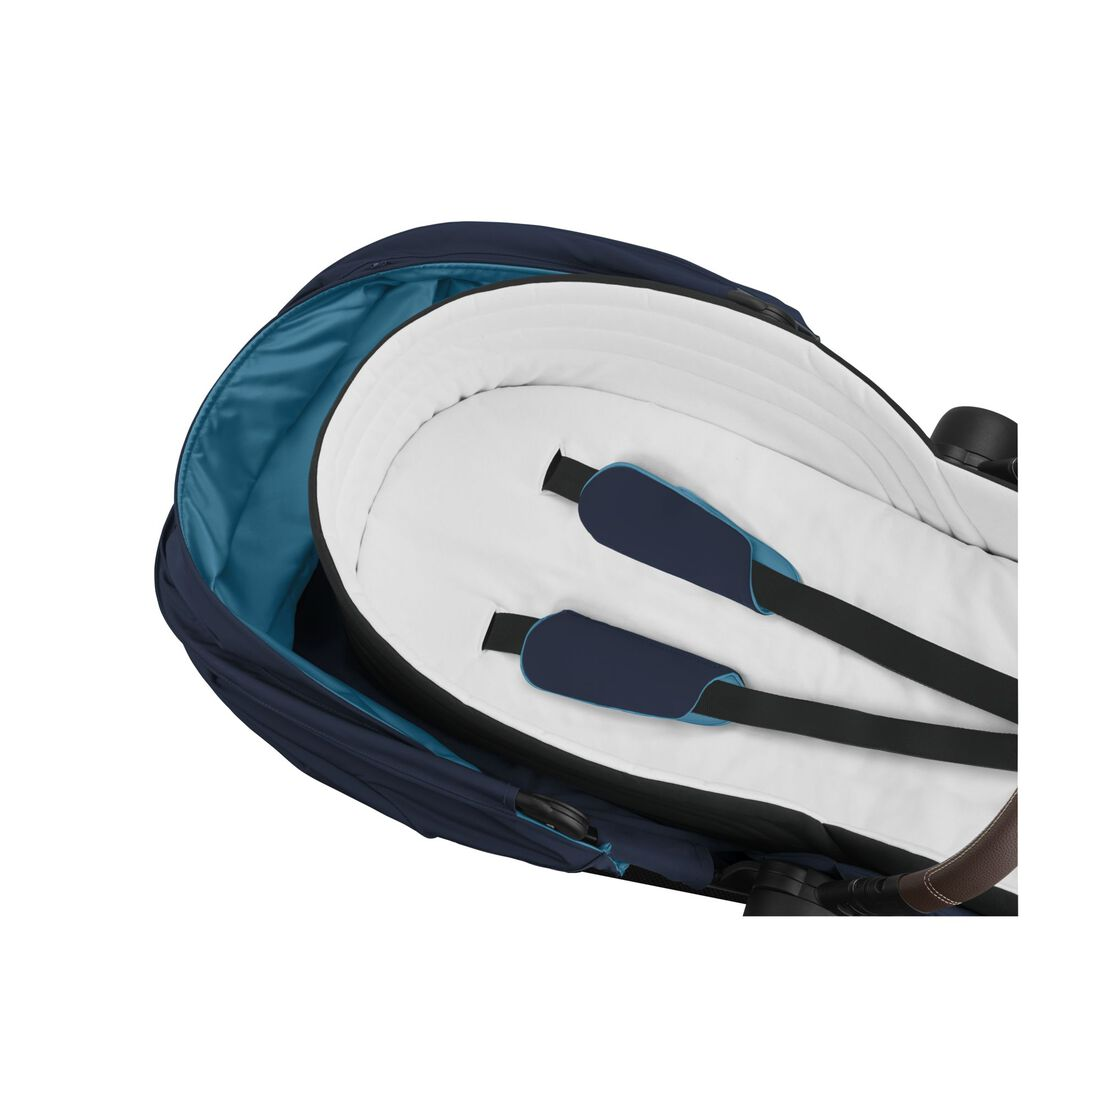 CYBEX Lite Cot - Nautical Blue in Nautical Blue large Bild 2